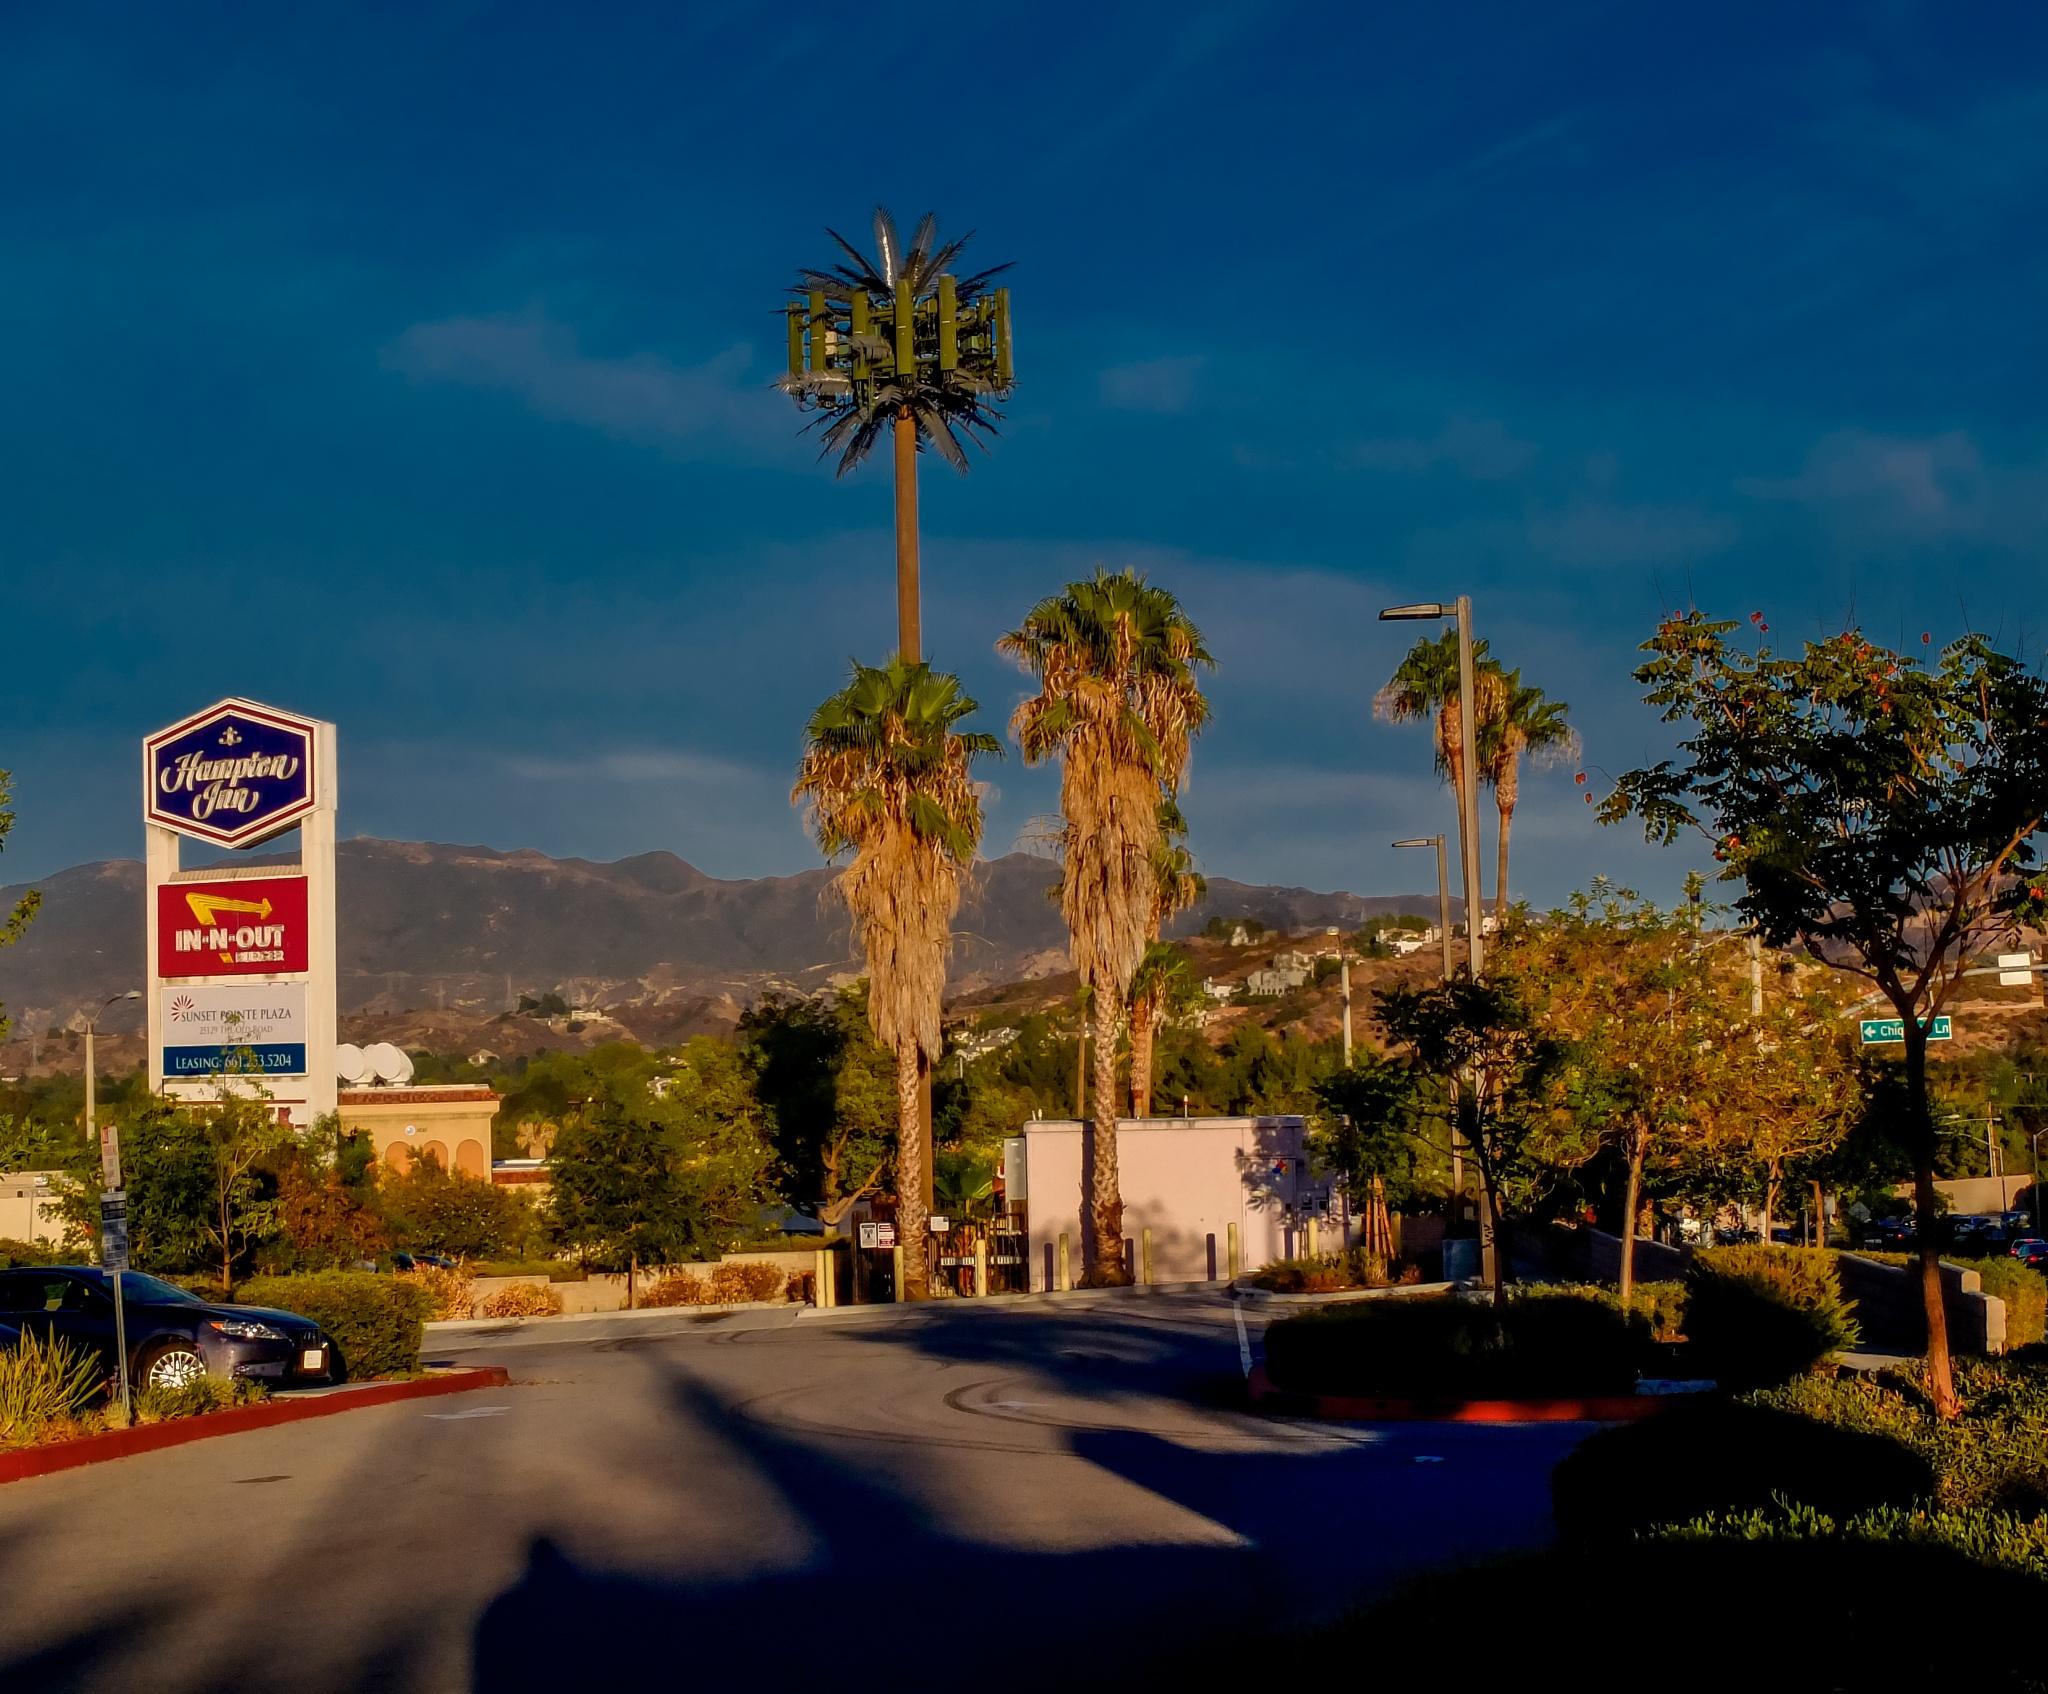 California dreaming by Alexander Hug